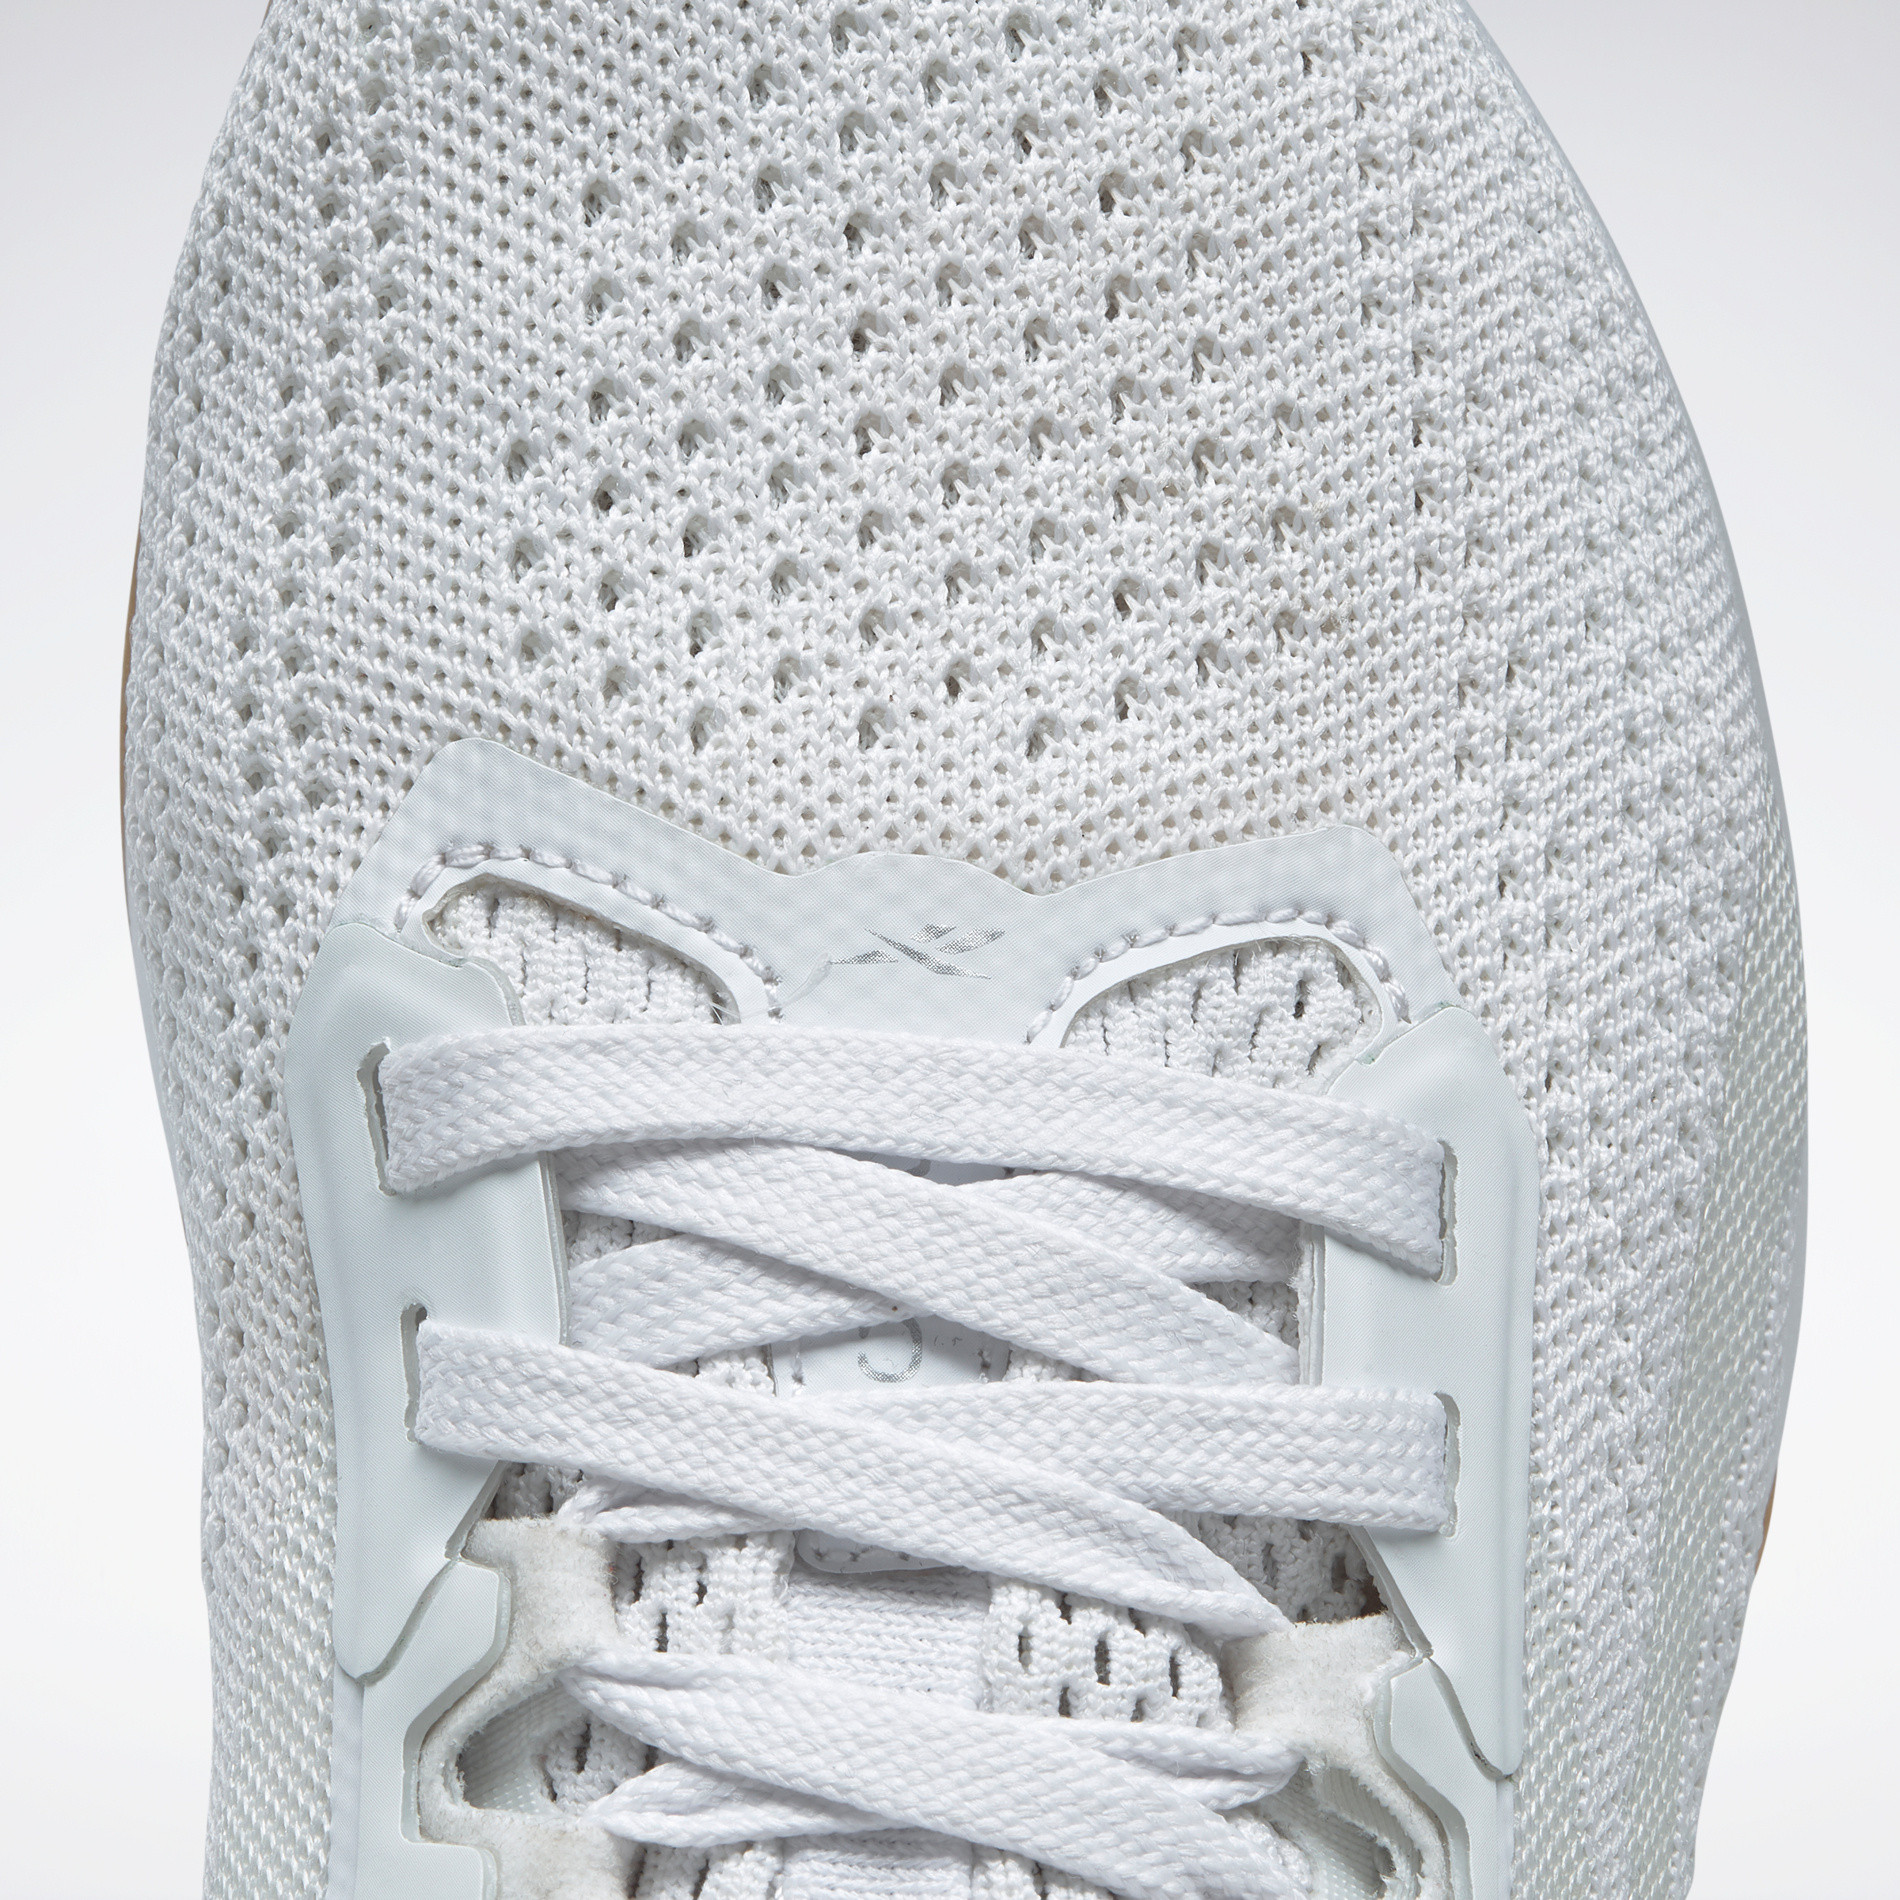 Scarpe NANO X1 donna, Bianco, large image number 5